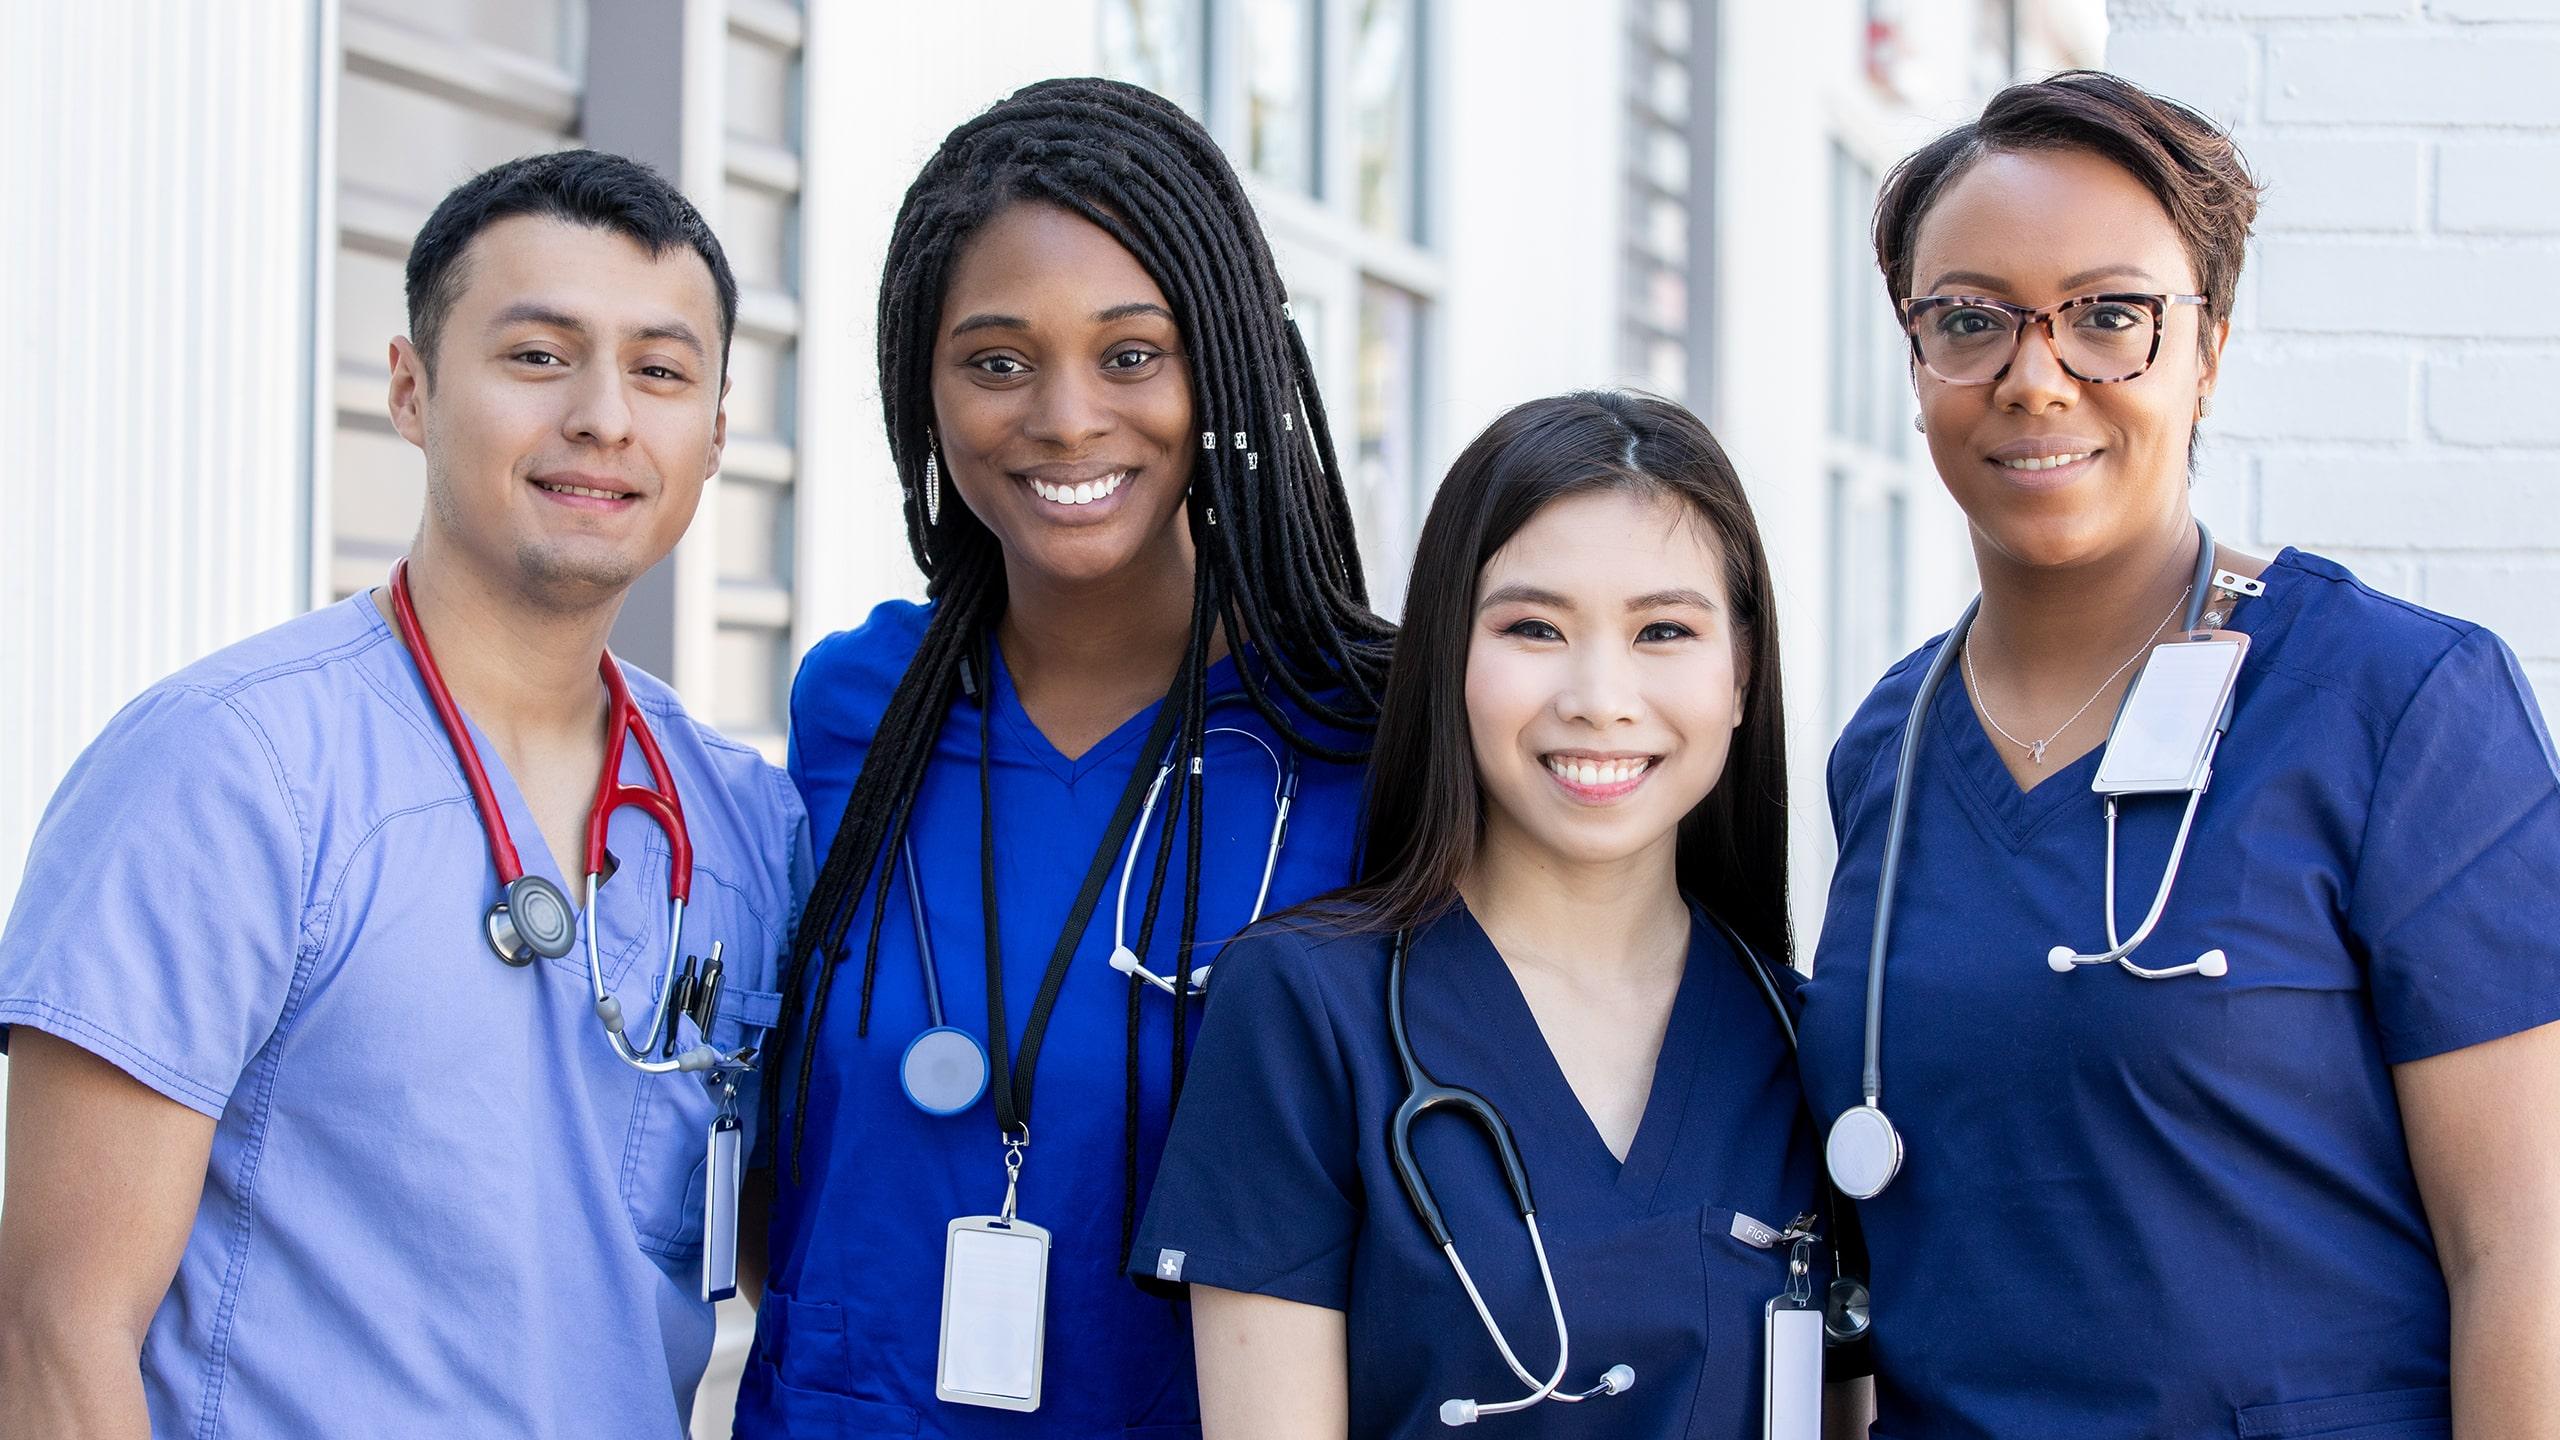 perdiem-nurse-team